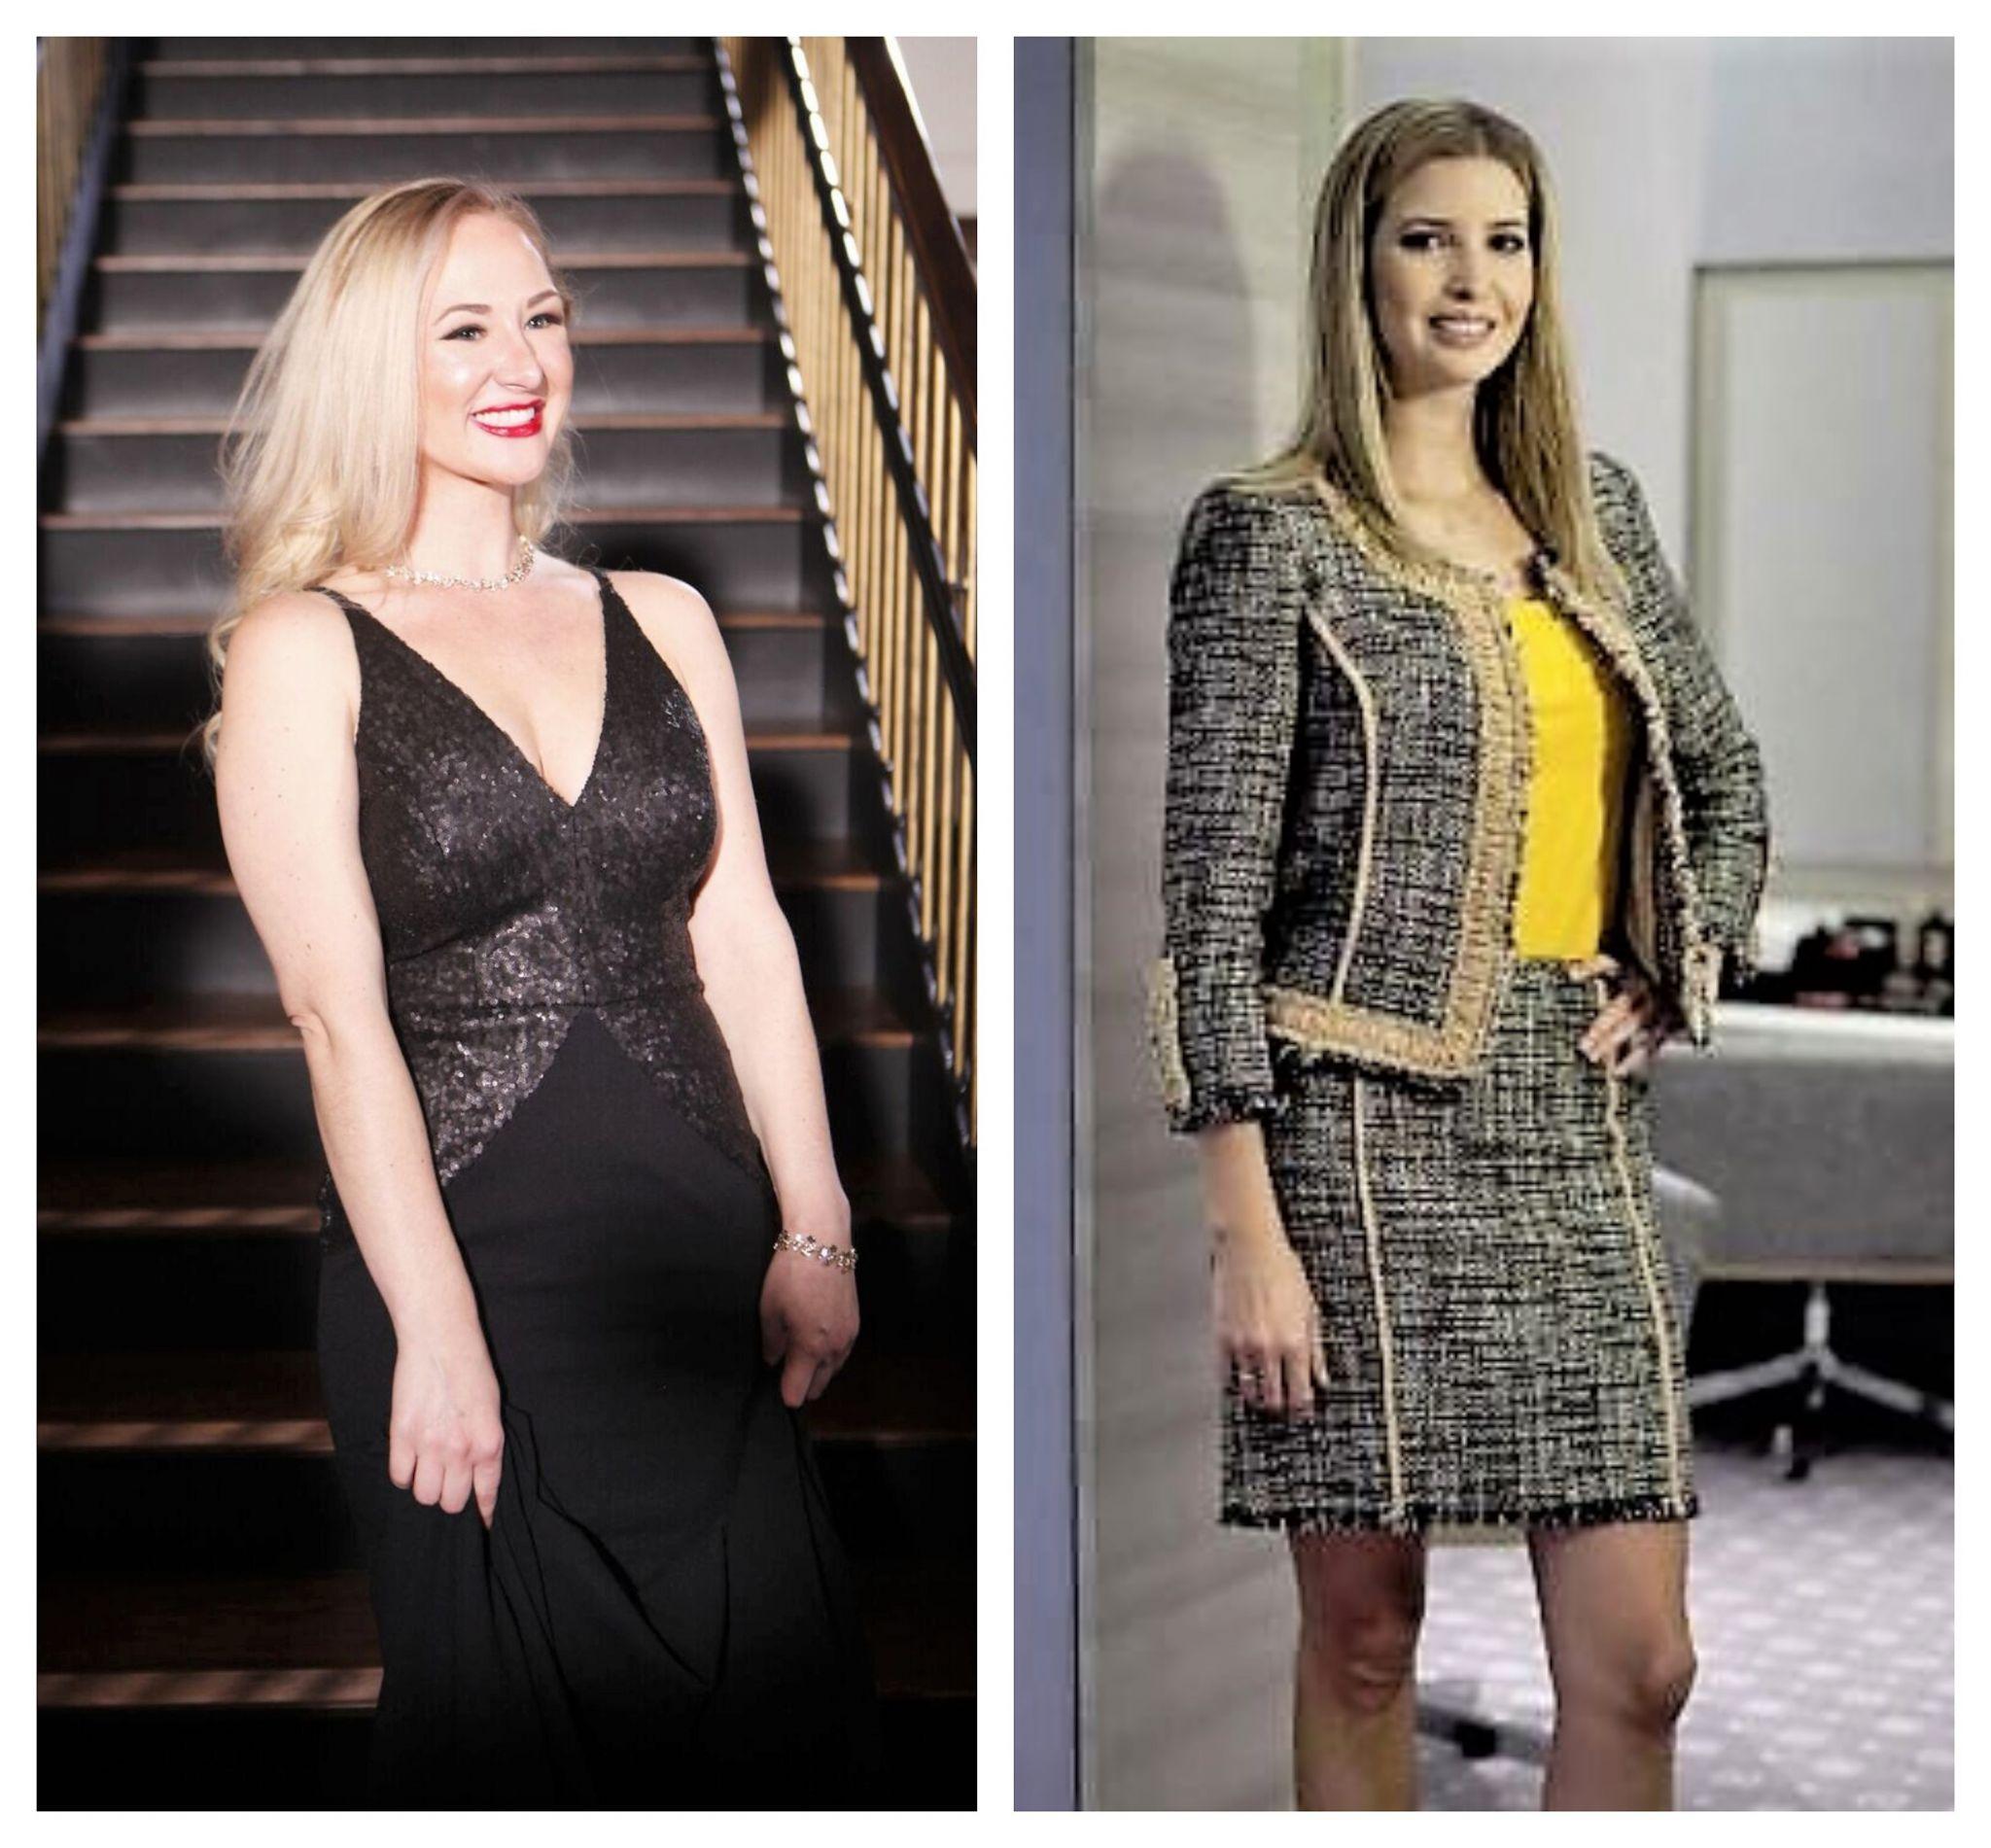 I Want To Look Like Ivanka Trump Houston Woman Undergoes Nine Surgical Procedures